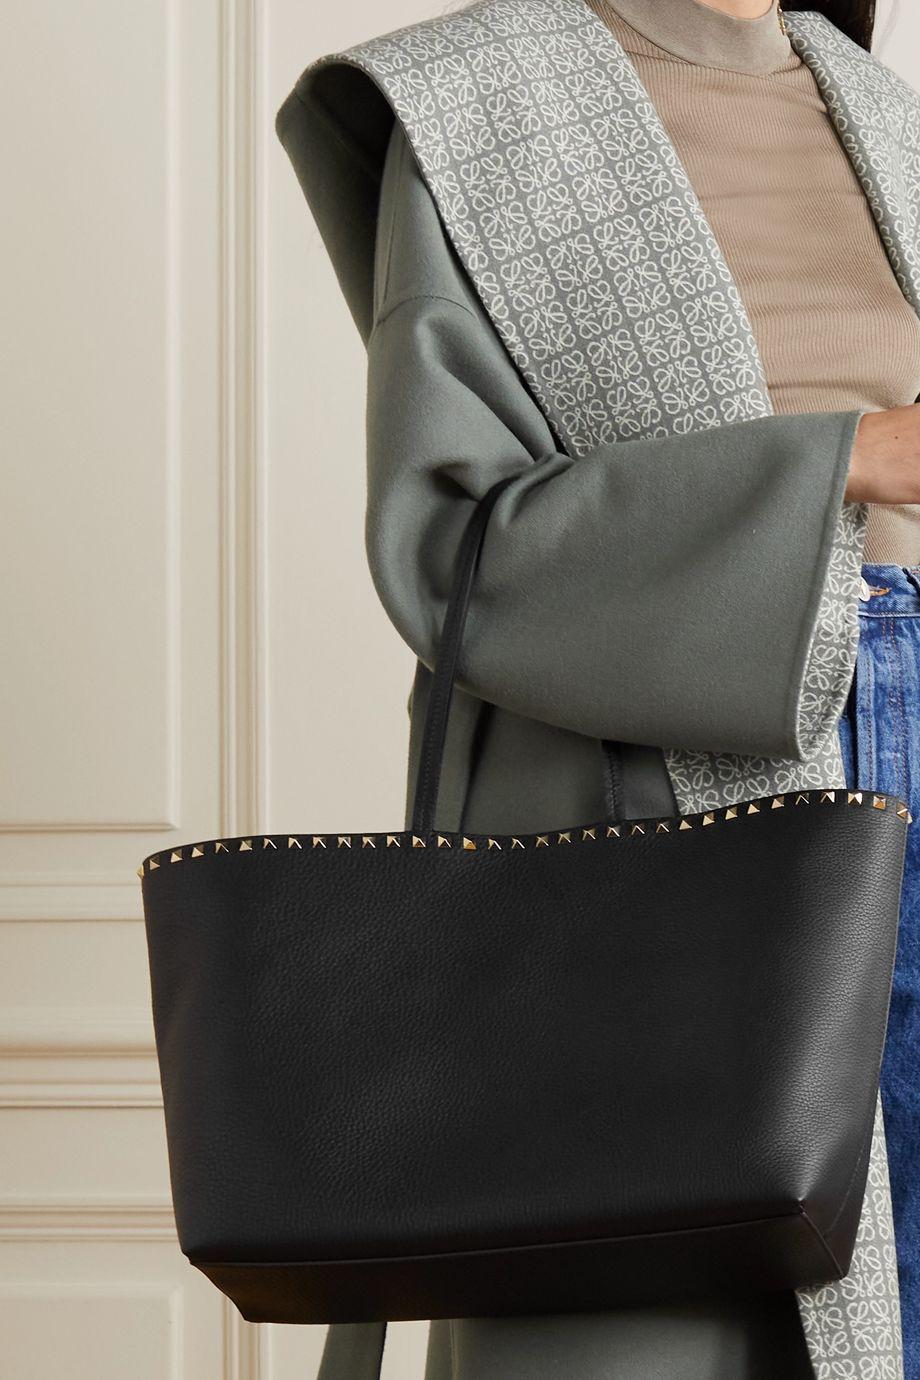 Valentino Valentino Garavani Rockstud textured-leather tote